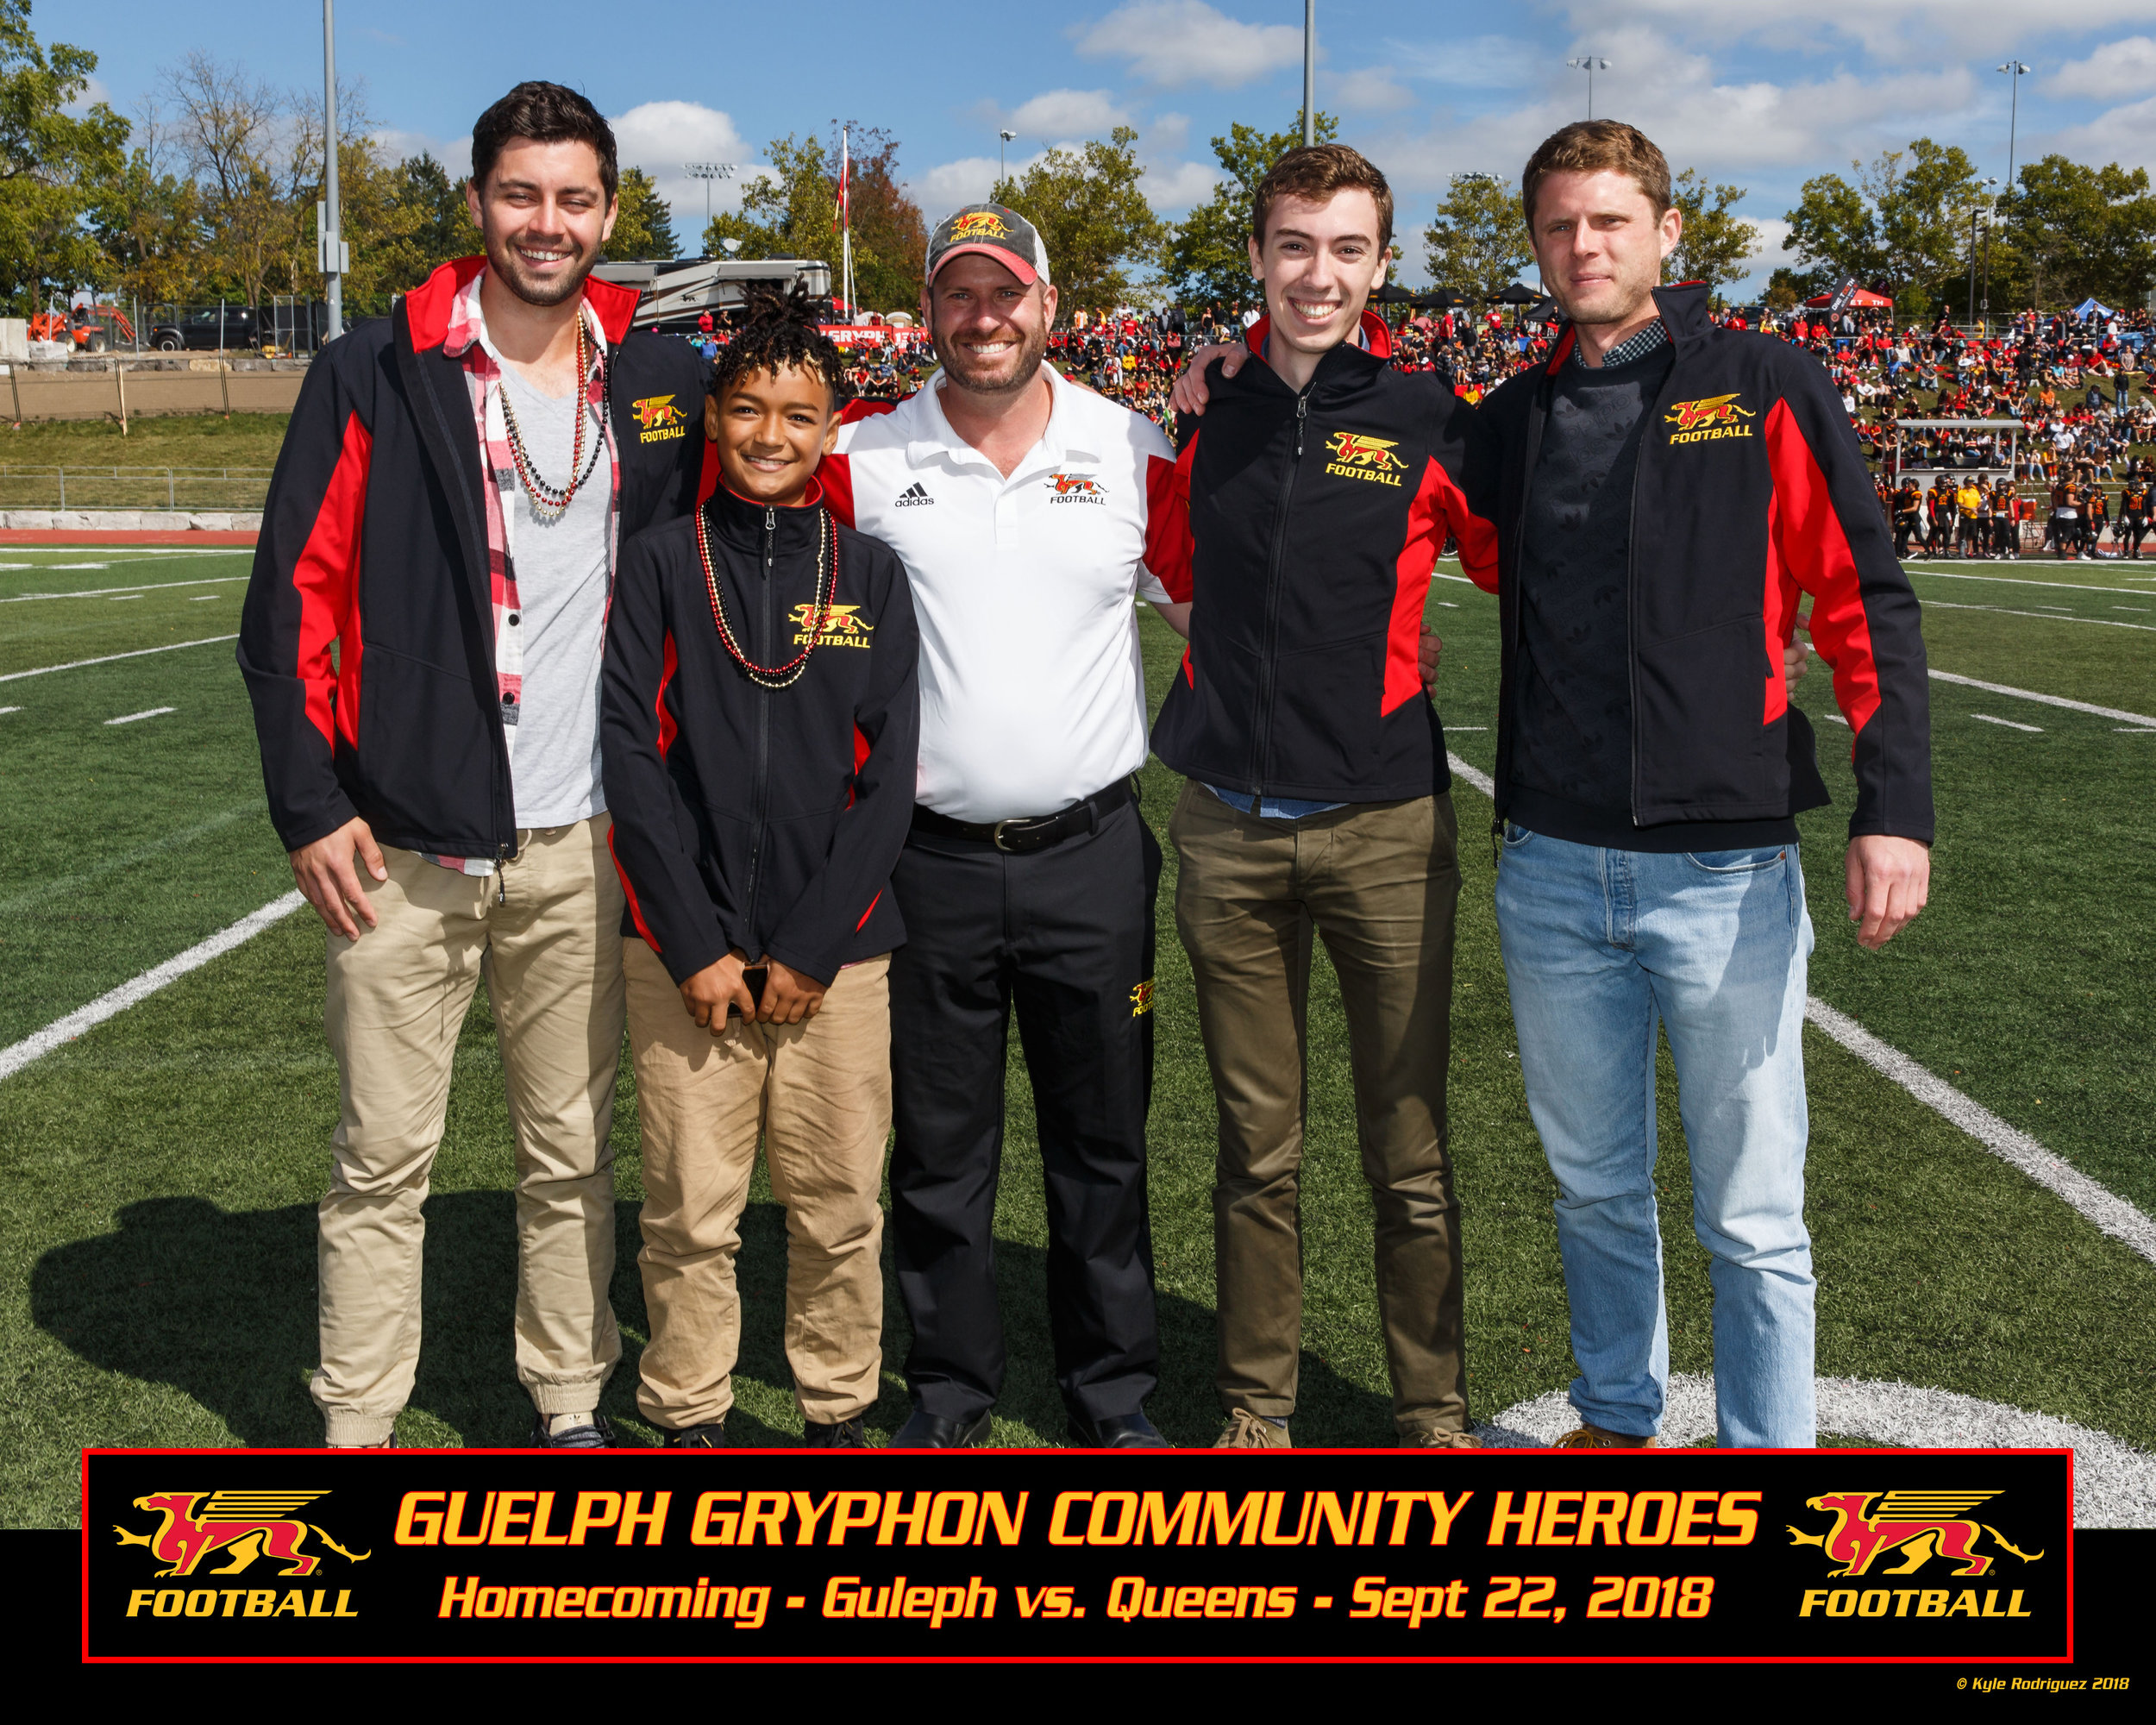 From left: Konrad, Shai, Scott McRoberts (UofG Athletic Director), Konrad, Justin.